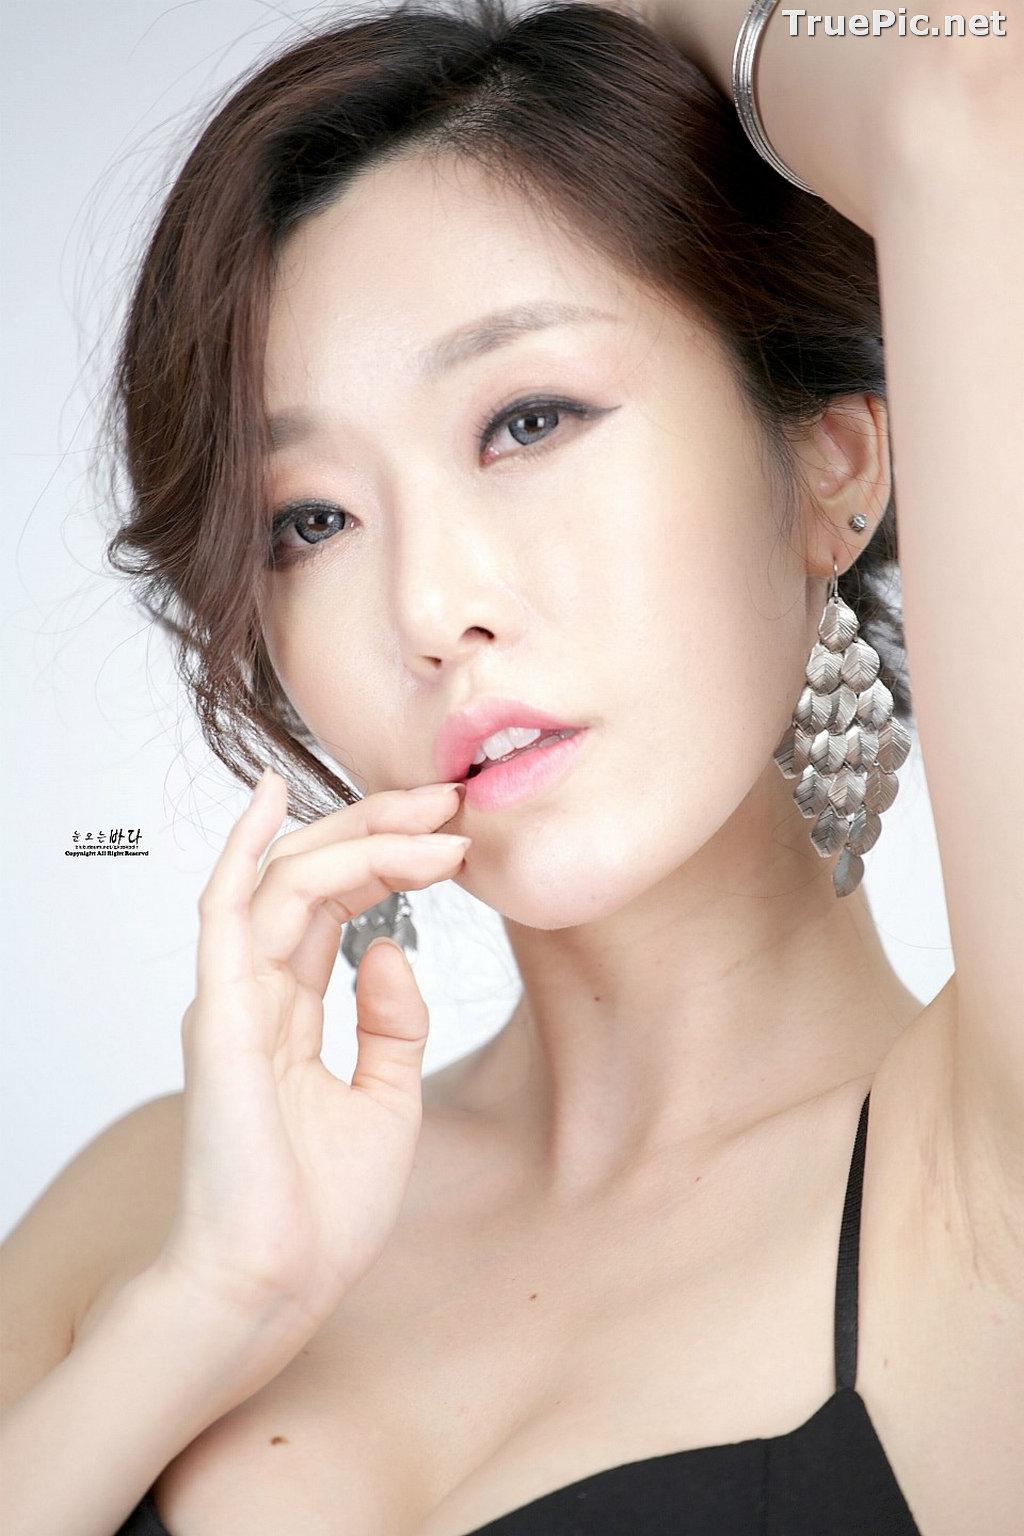 Image Oh Ha Ru Model Beautiful Image – Studio Photoshoot Collection #2 - TruePic.net - Picture-10